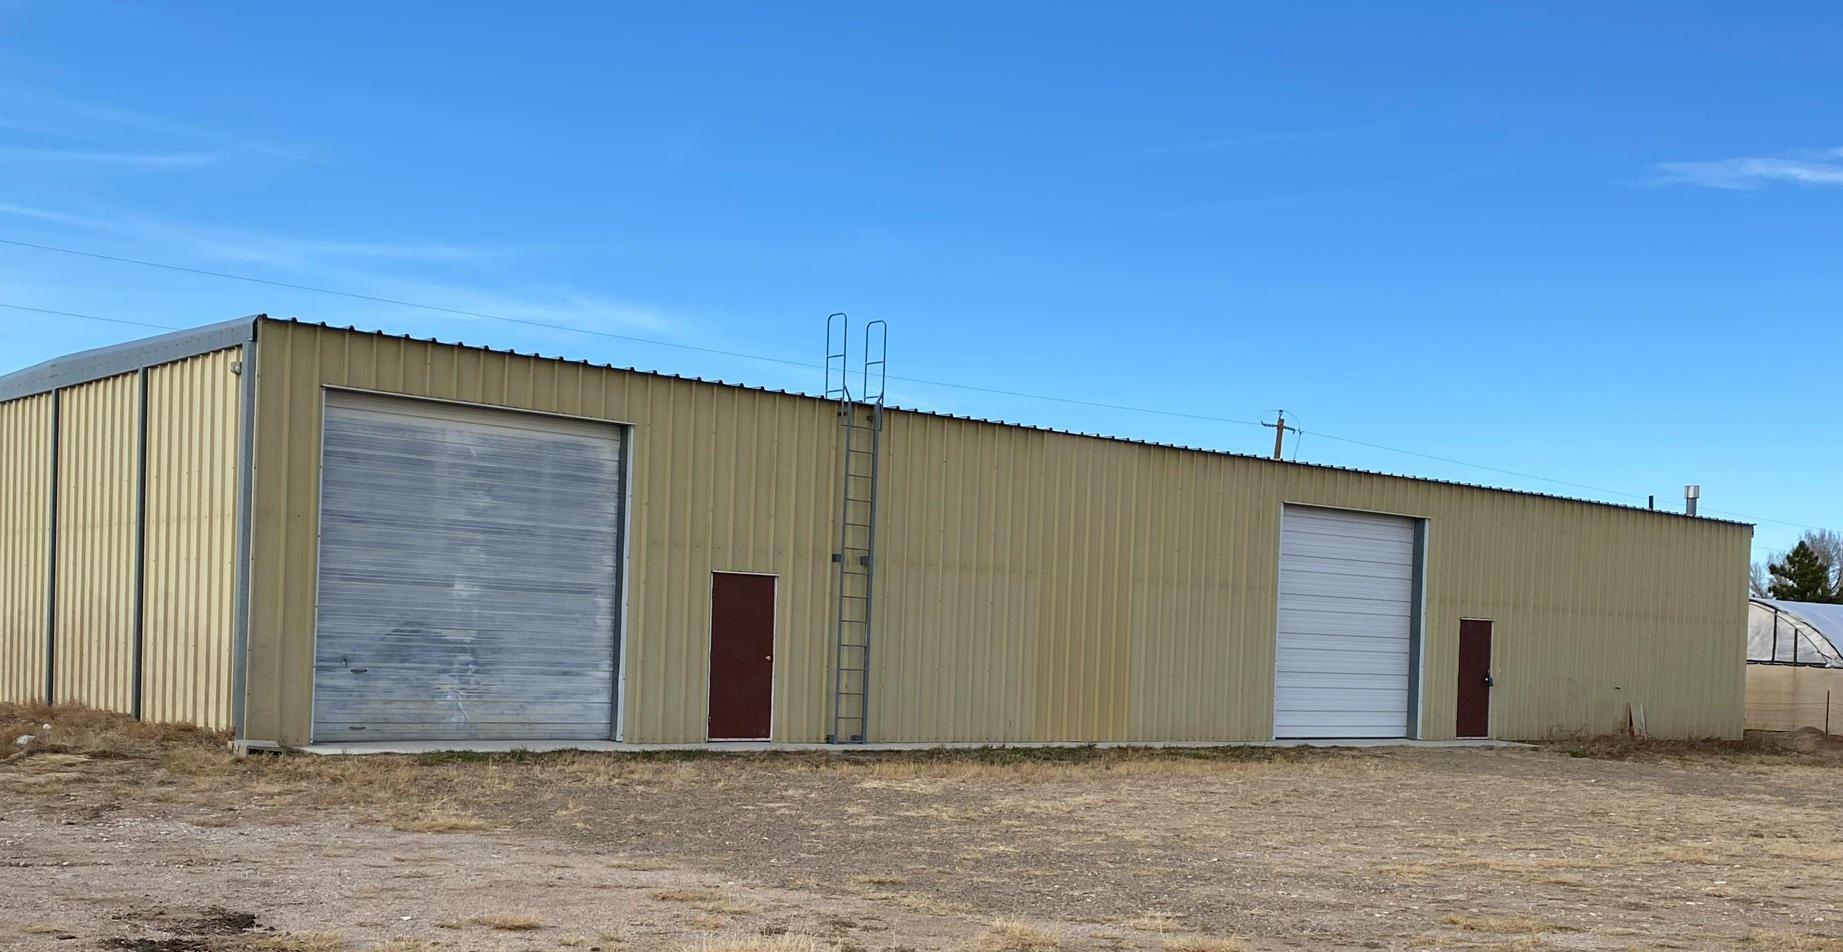 8 SPENCER Road, Estancia, NM 87016 - #: 979267